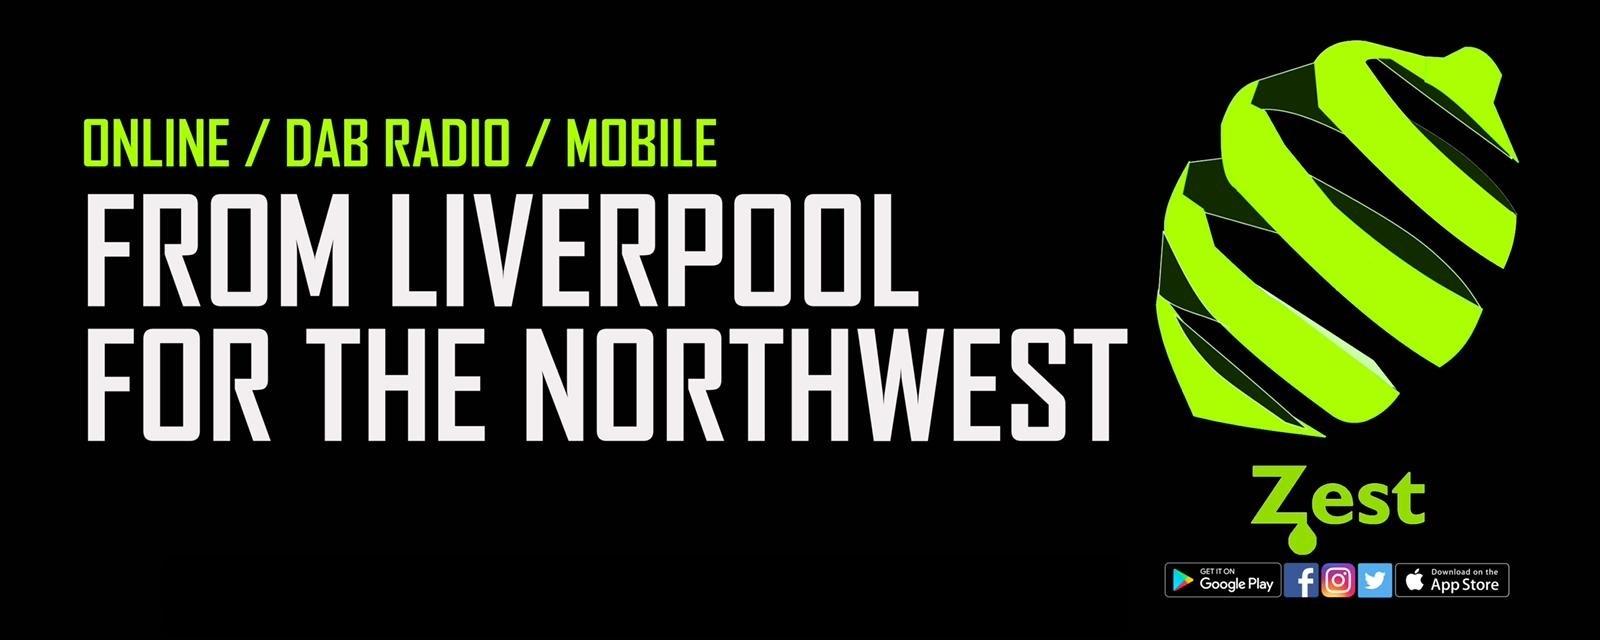 Zest North West | OK GOOGLE – PLAY ZEST on Tune-In